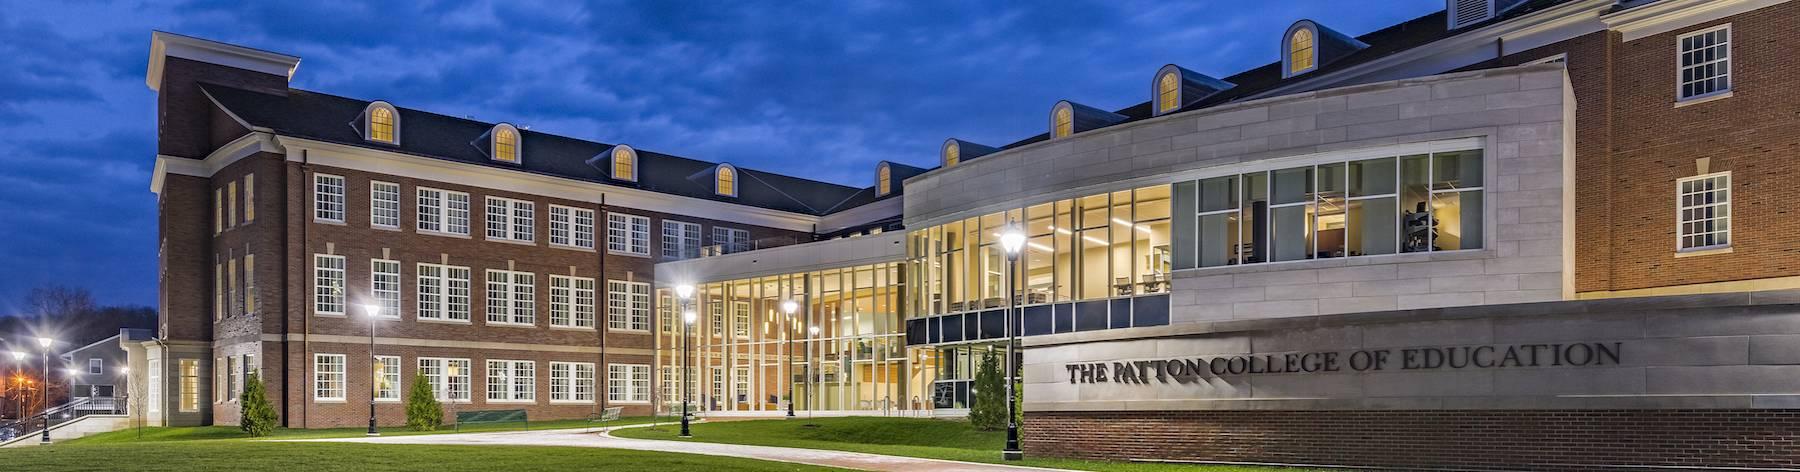 Patton College of Education | Ohio University